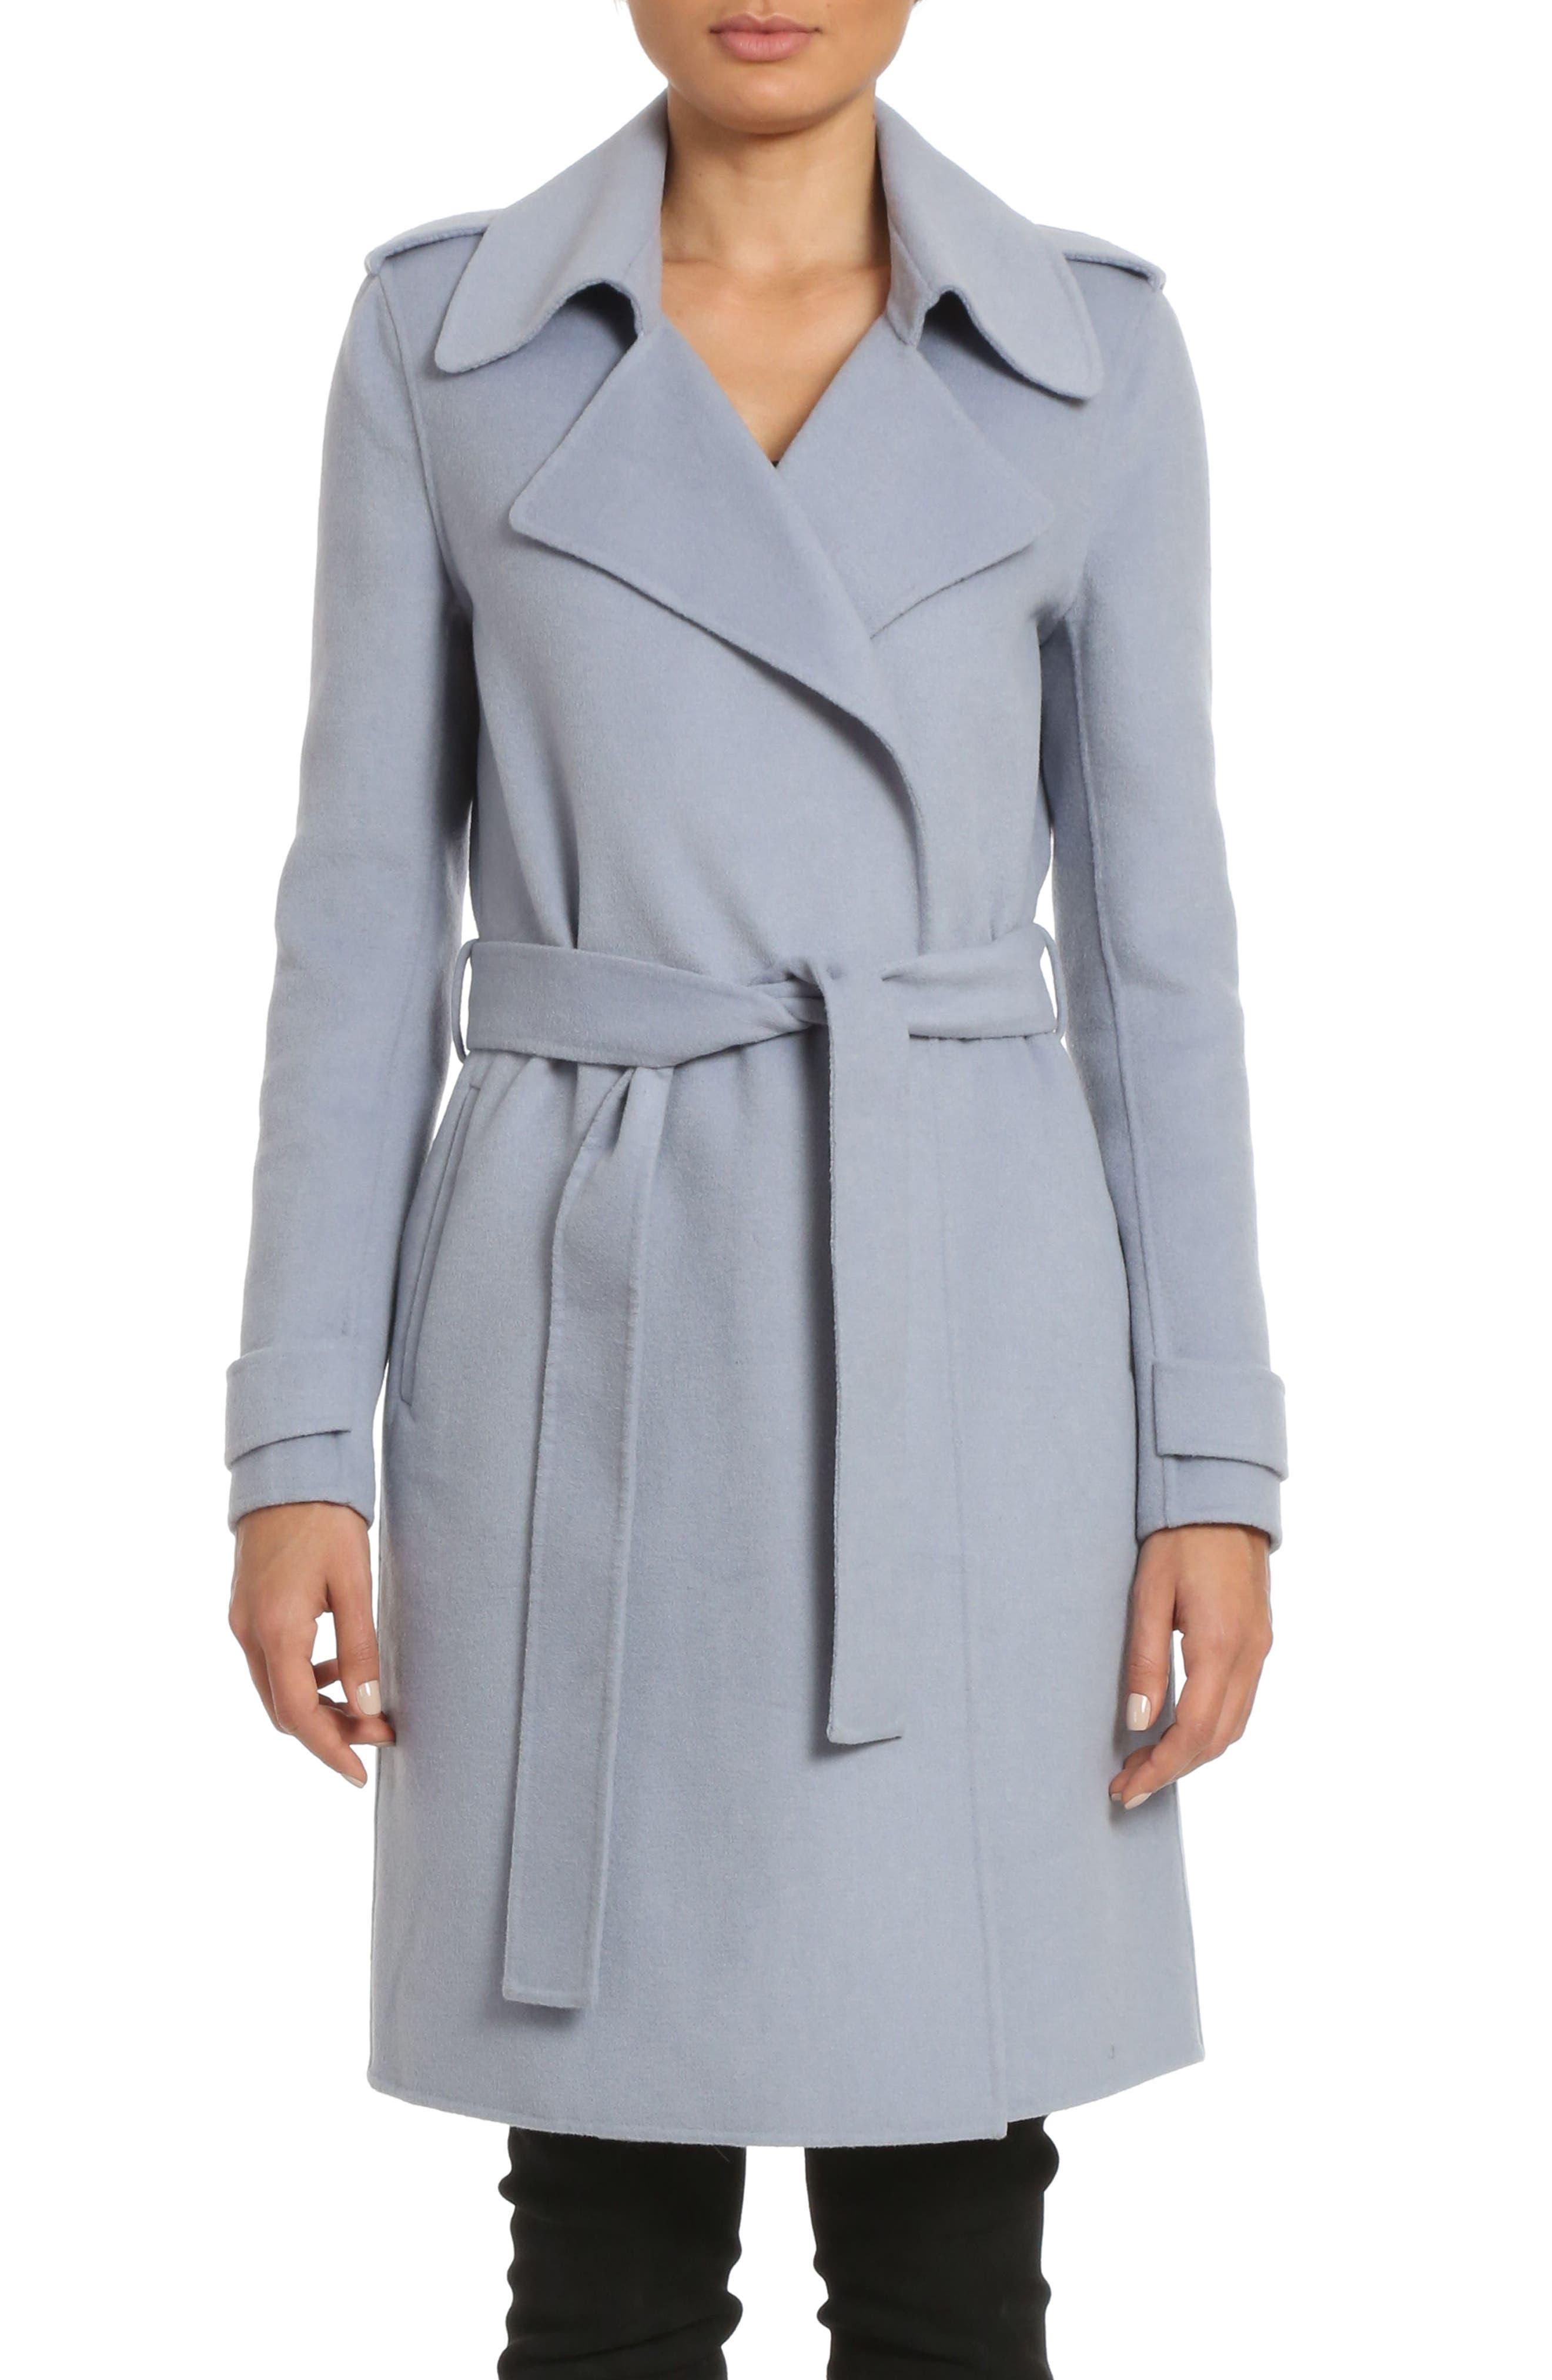 Badgley Mischka Alexis Double Face Wool Blend Long Wrap Coat